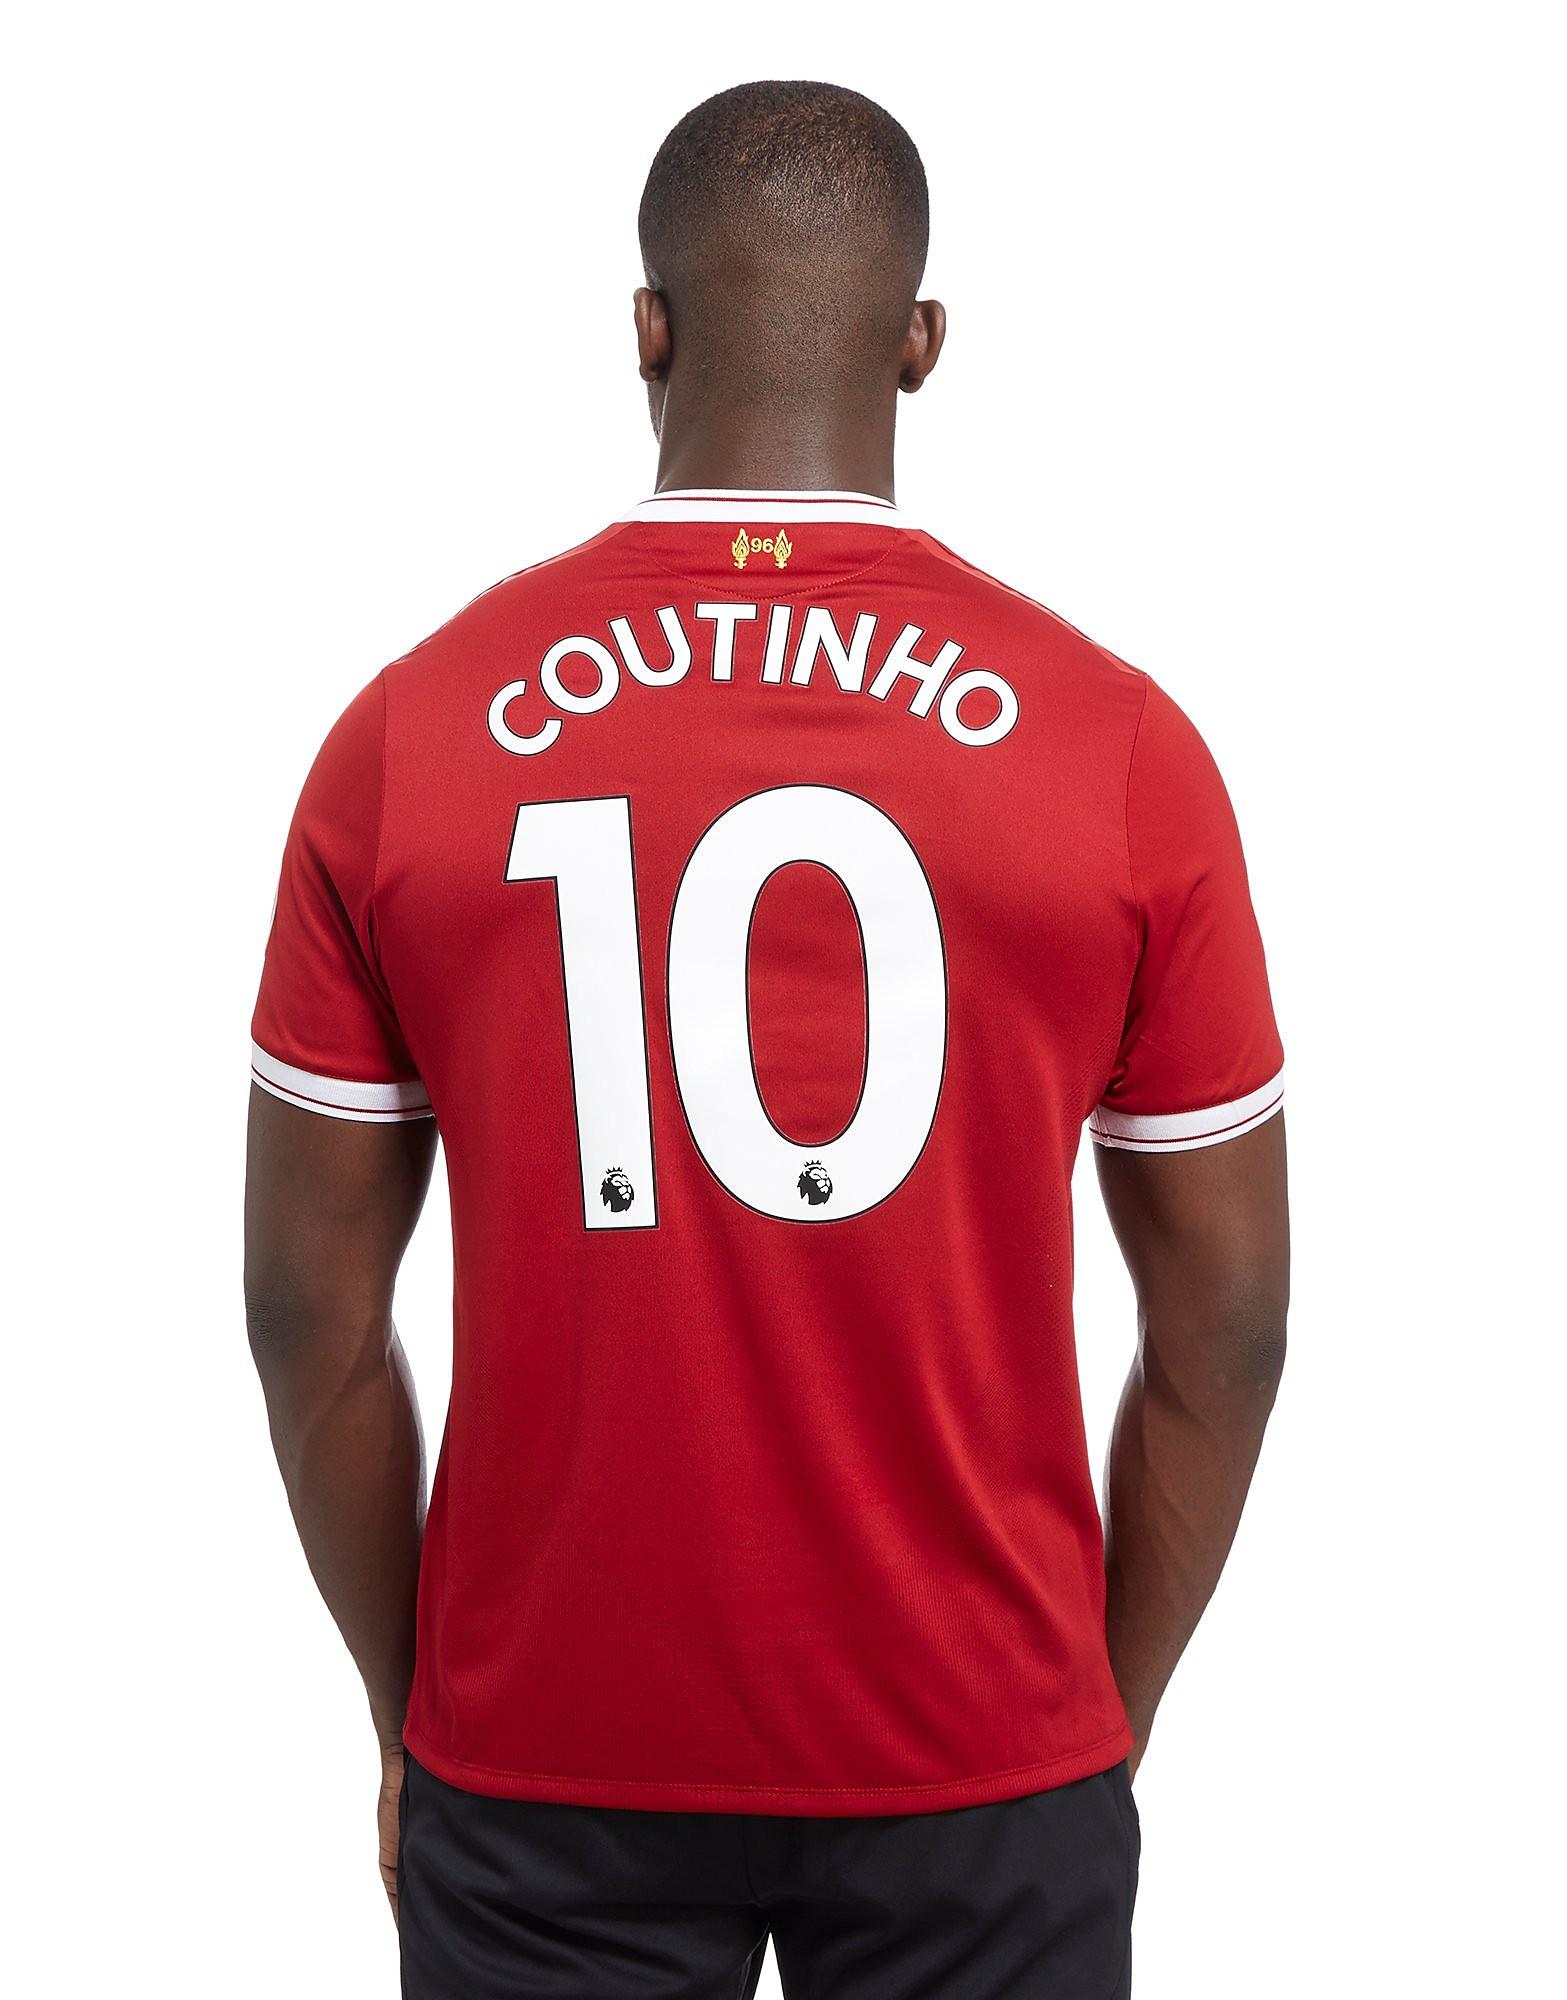 New Balance Liverpool FC Coutinho #10 2017/18 Home Shirt